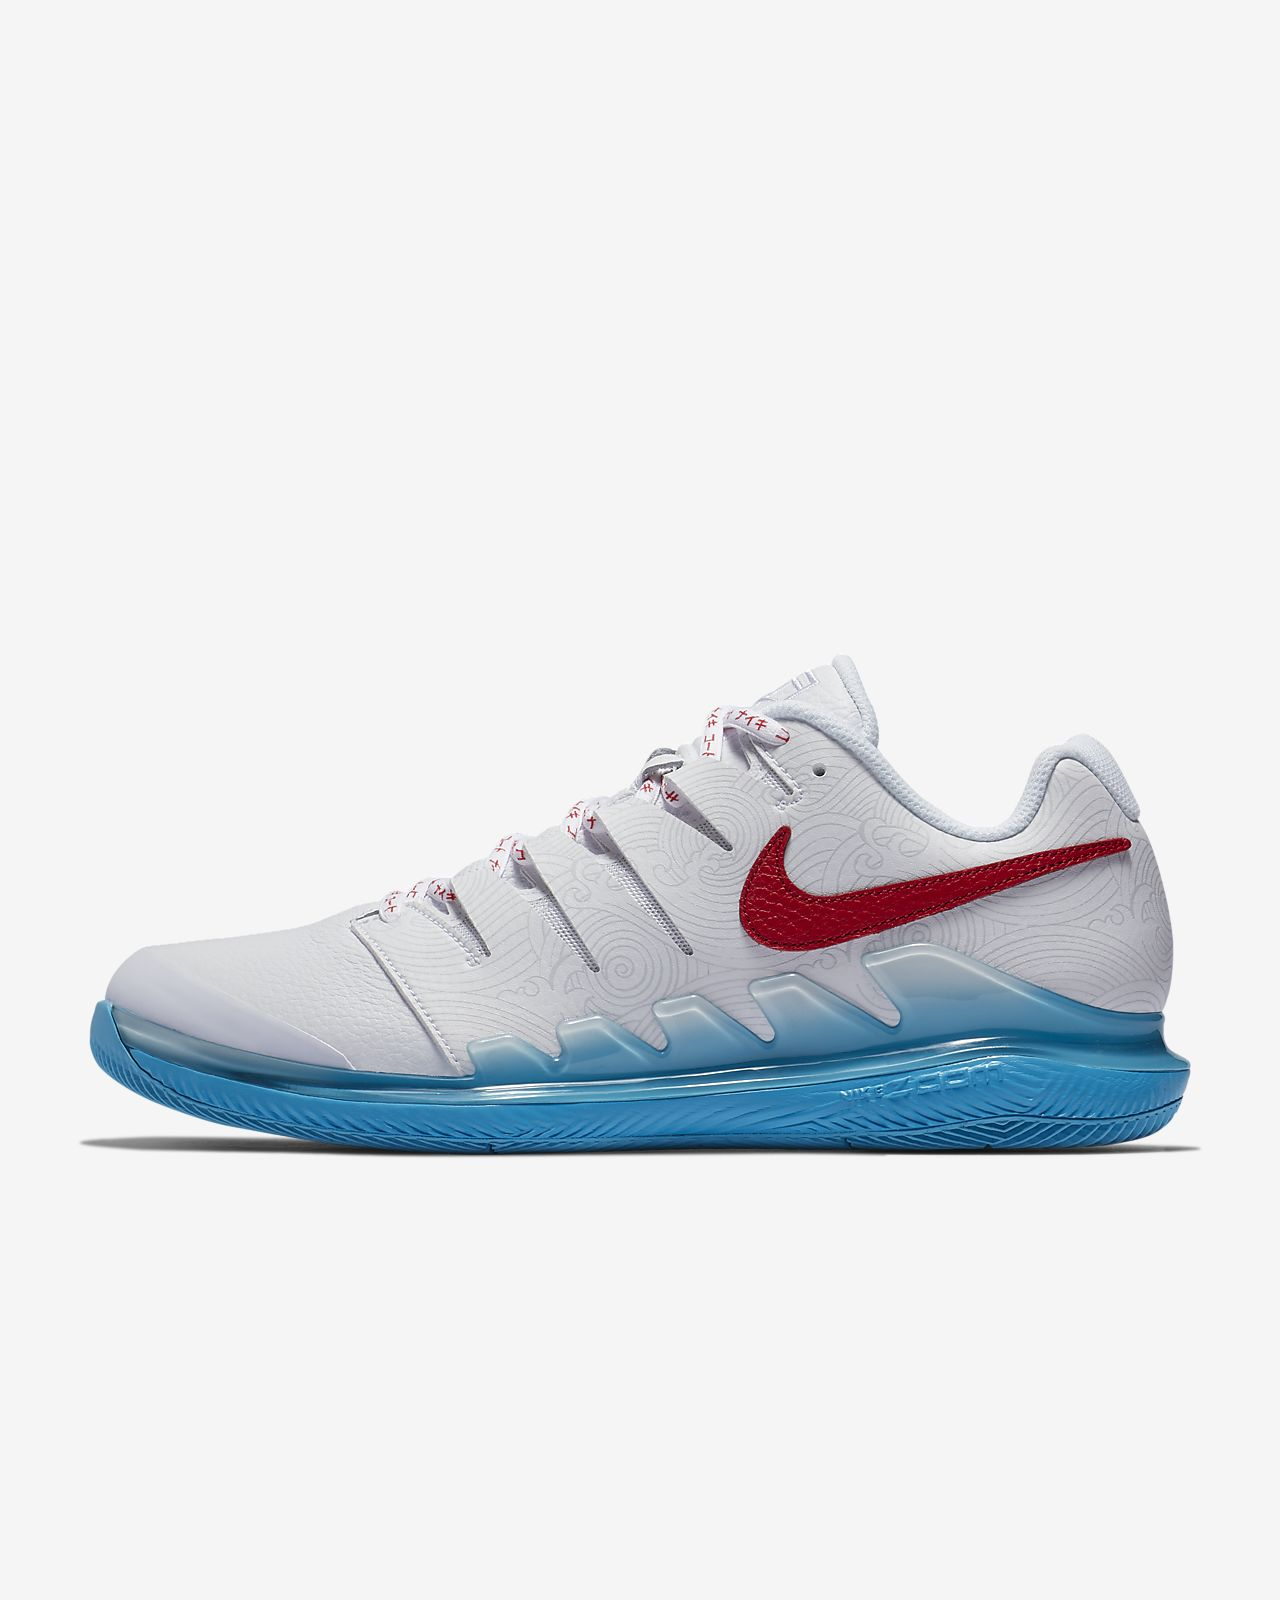 Nike Air Zoom Vapor X LTRHard Court 男子网球鞋